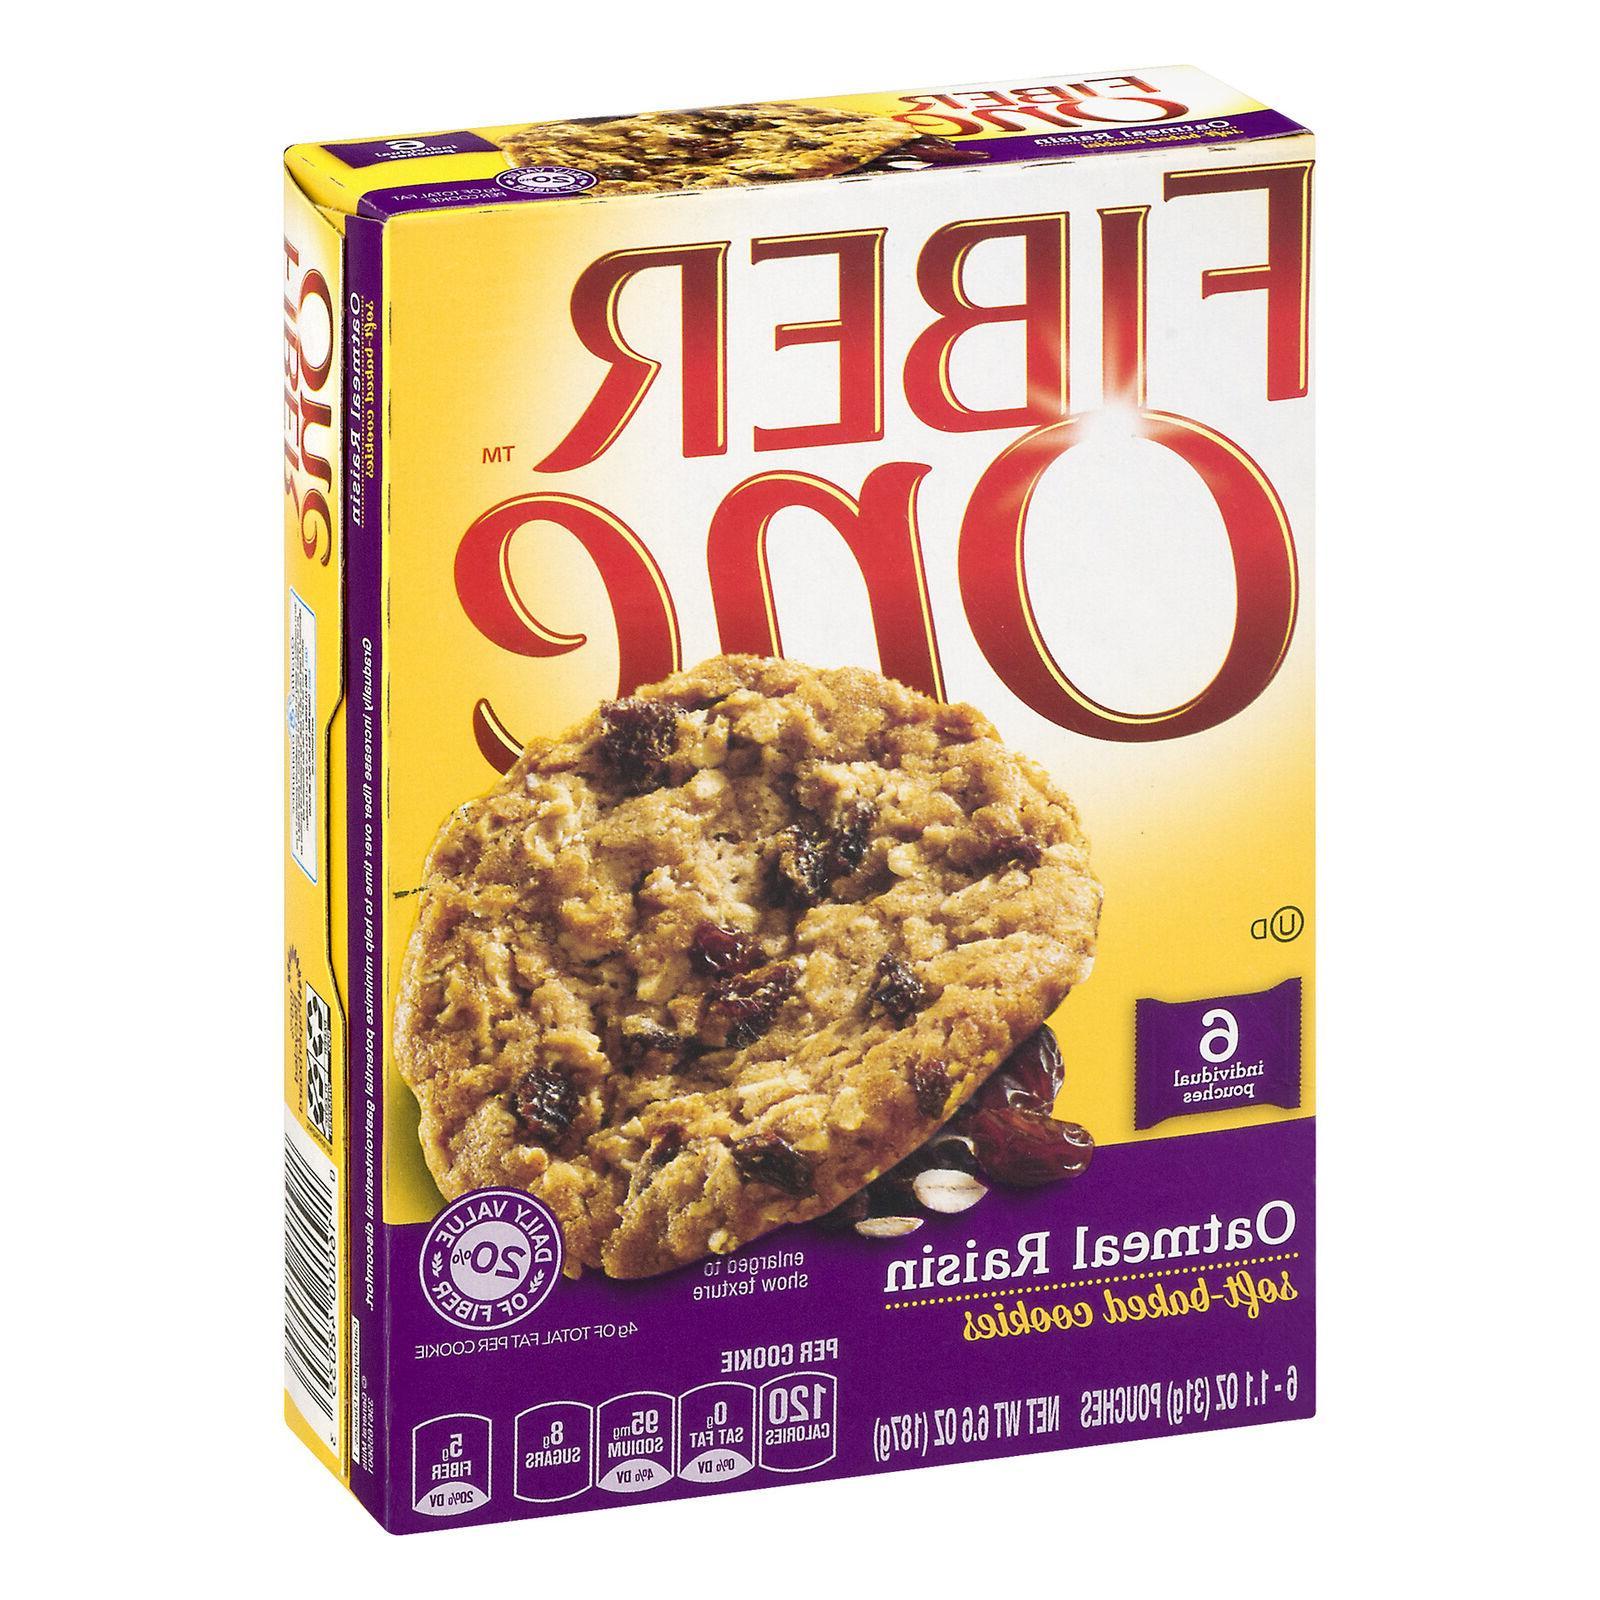 One Raisin Cookies, 6 Shipping